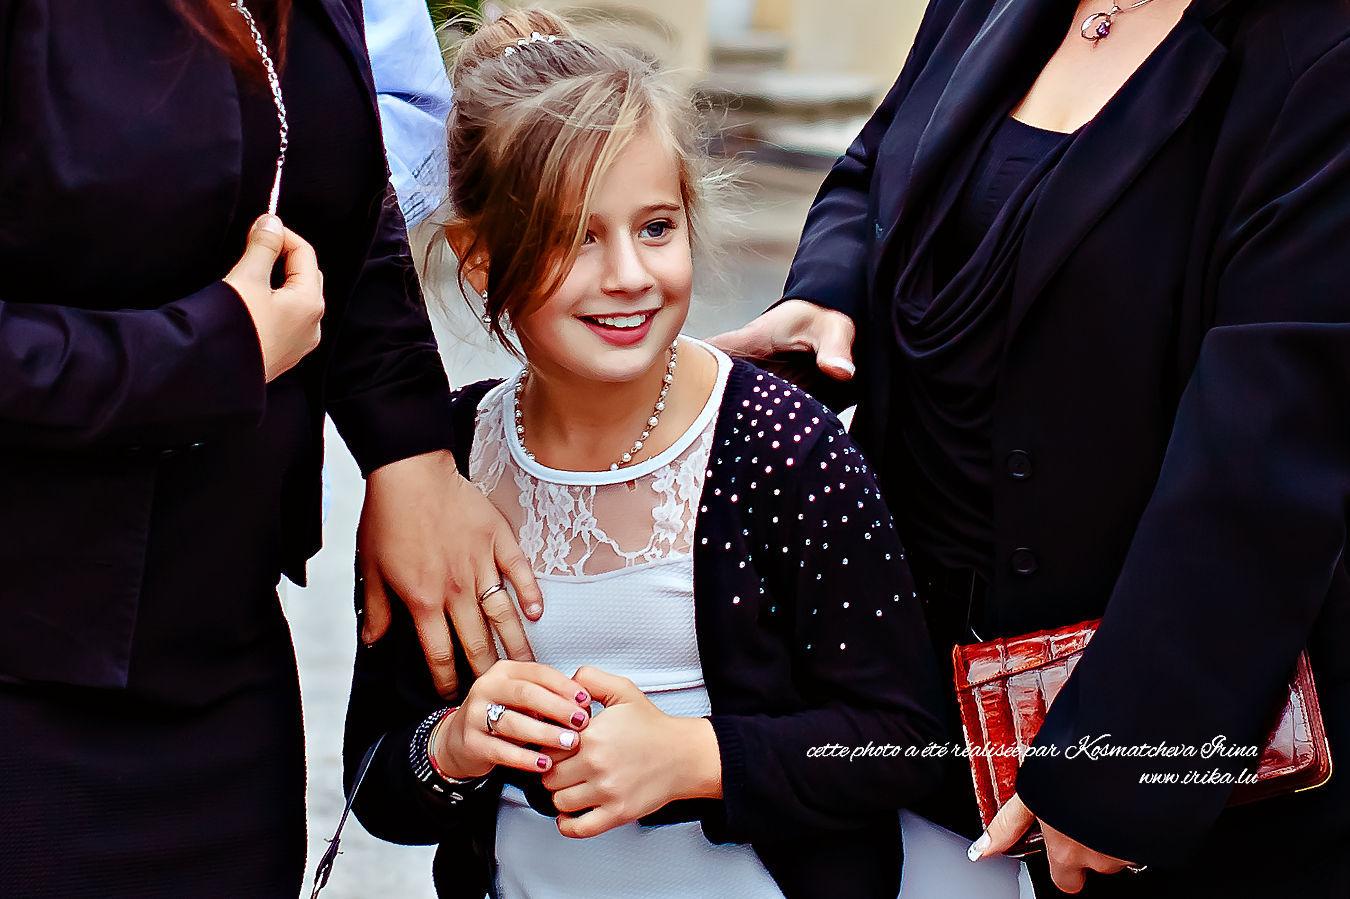 La plus jeune fille invitée au mariage